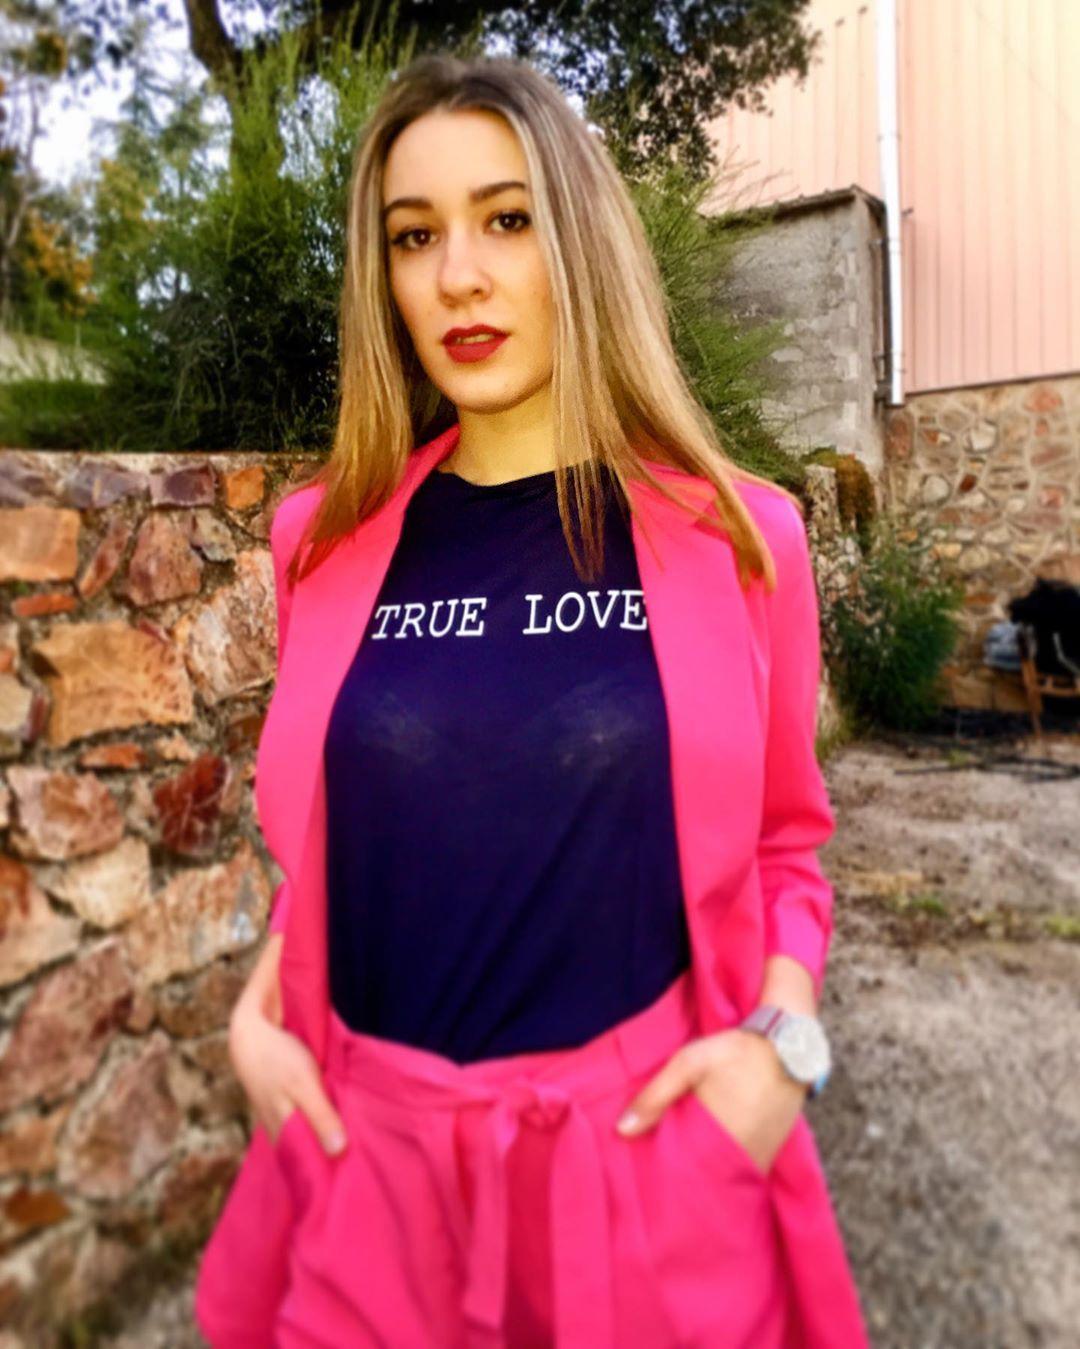 🚺 lovely look 🚺  www.shaulashop.com 💓 TRUE LOVE: EL AMOR VERDADERO NACE DE LOS TIEMPOS DIFÍCILES 💓 . . . . #amorporlamoda #tendencia #fashion #moda #outfits #mujeresempoderadas #dress #gril #shaulacollection #personalshopper #shaulastyle #fashion #enviosatodoelpais #modaactual #shaulagirls #moderna #truelove #store #spring #t